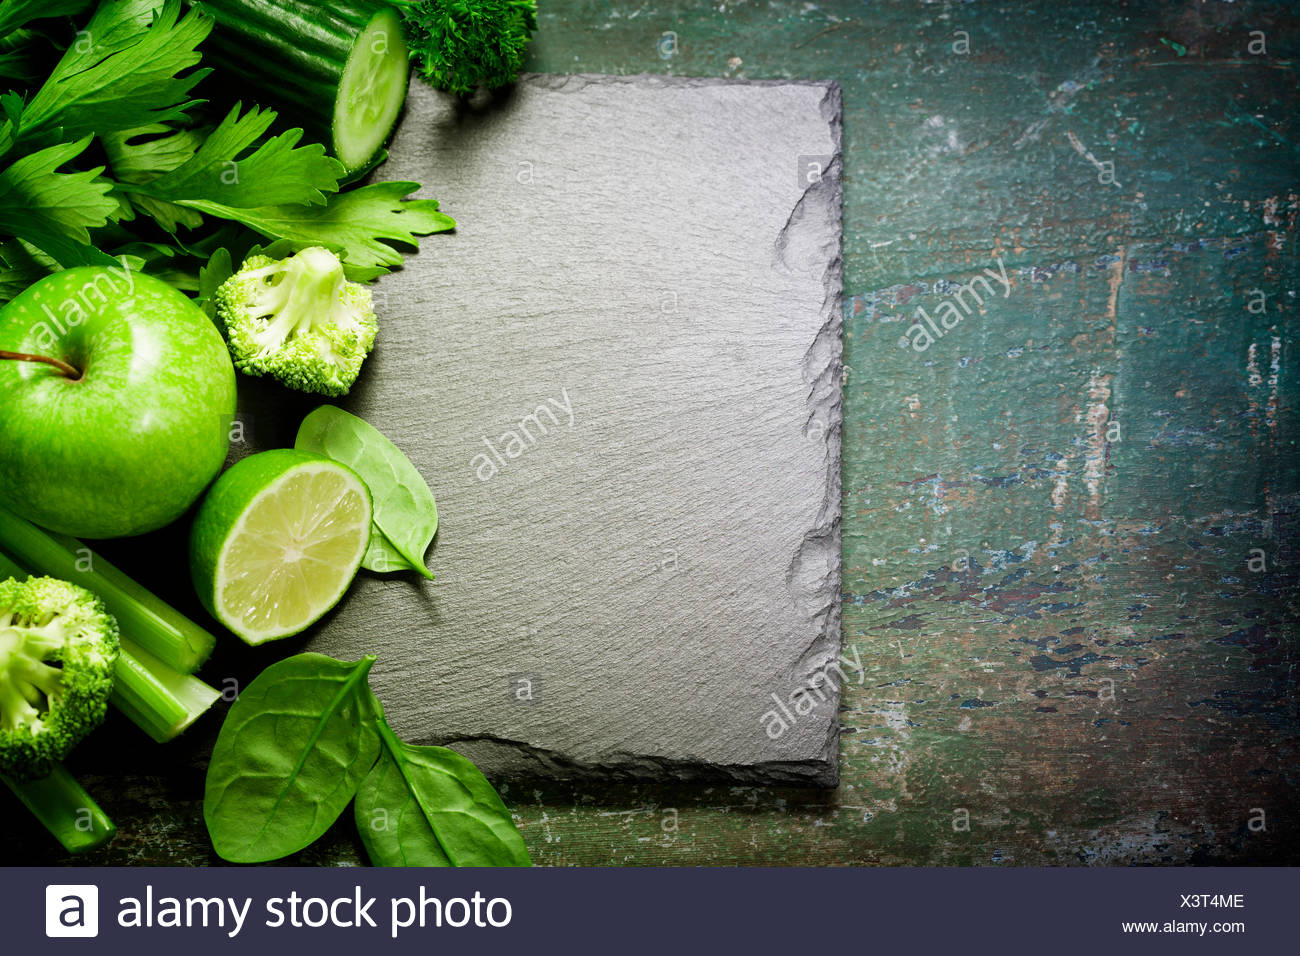 Verduras verdes frescas en vintage de fondo - detox, dieta o concepto de comida saludable Imagen De Stock